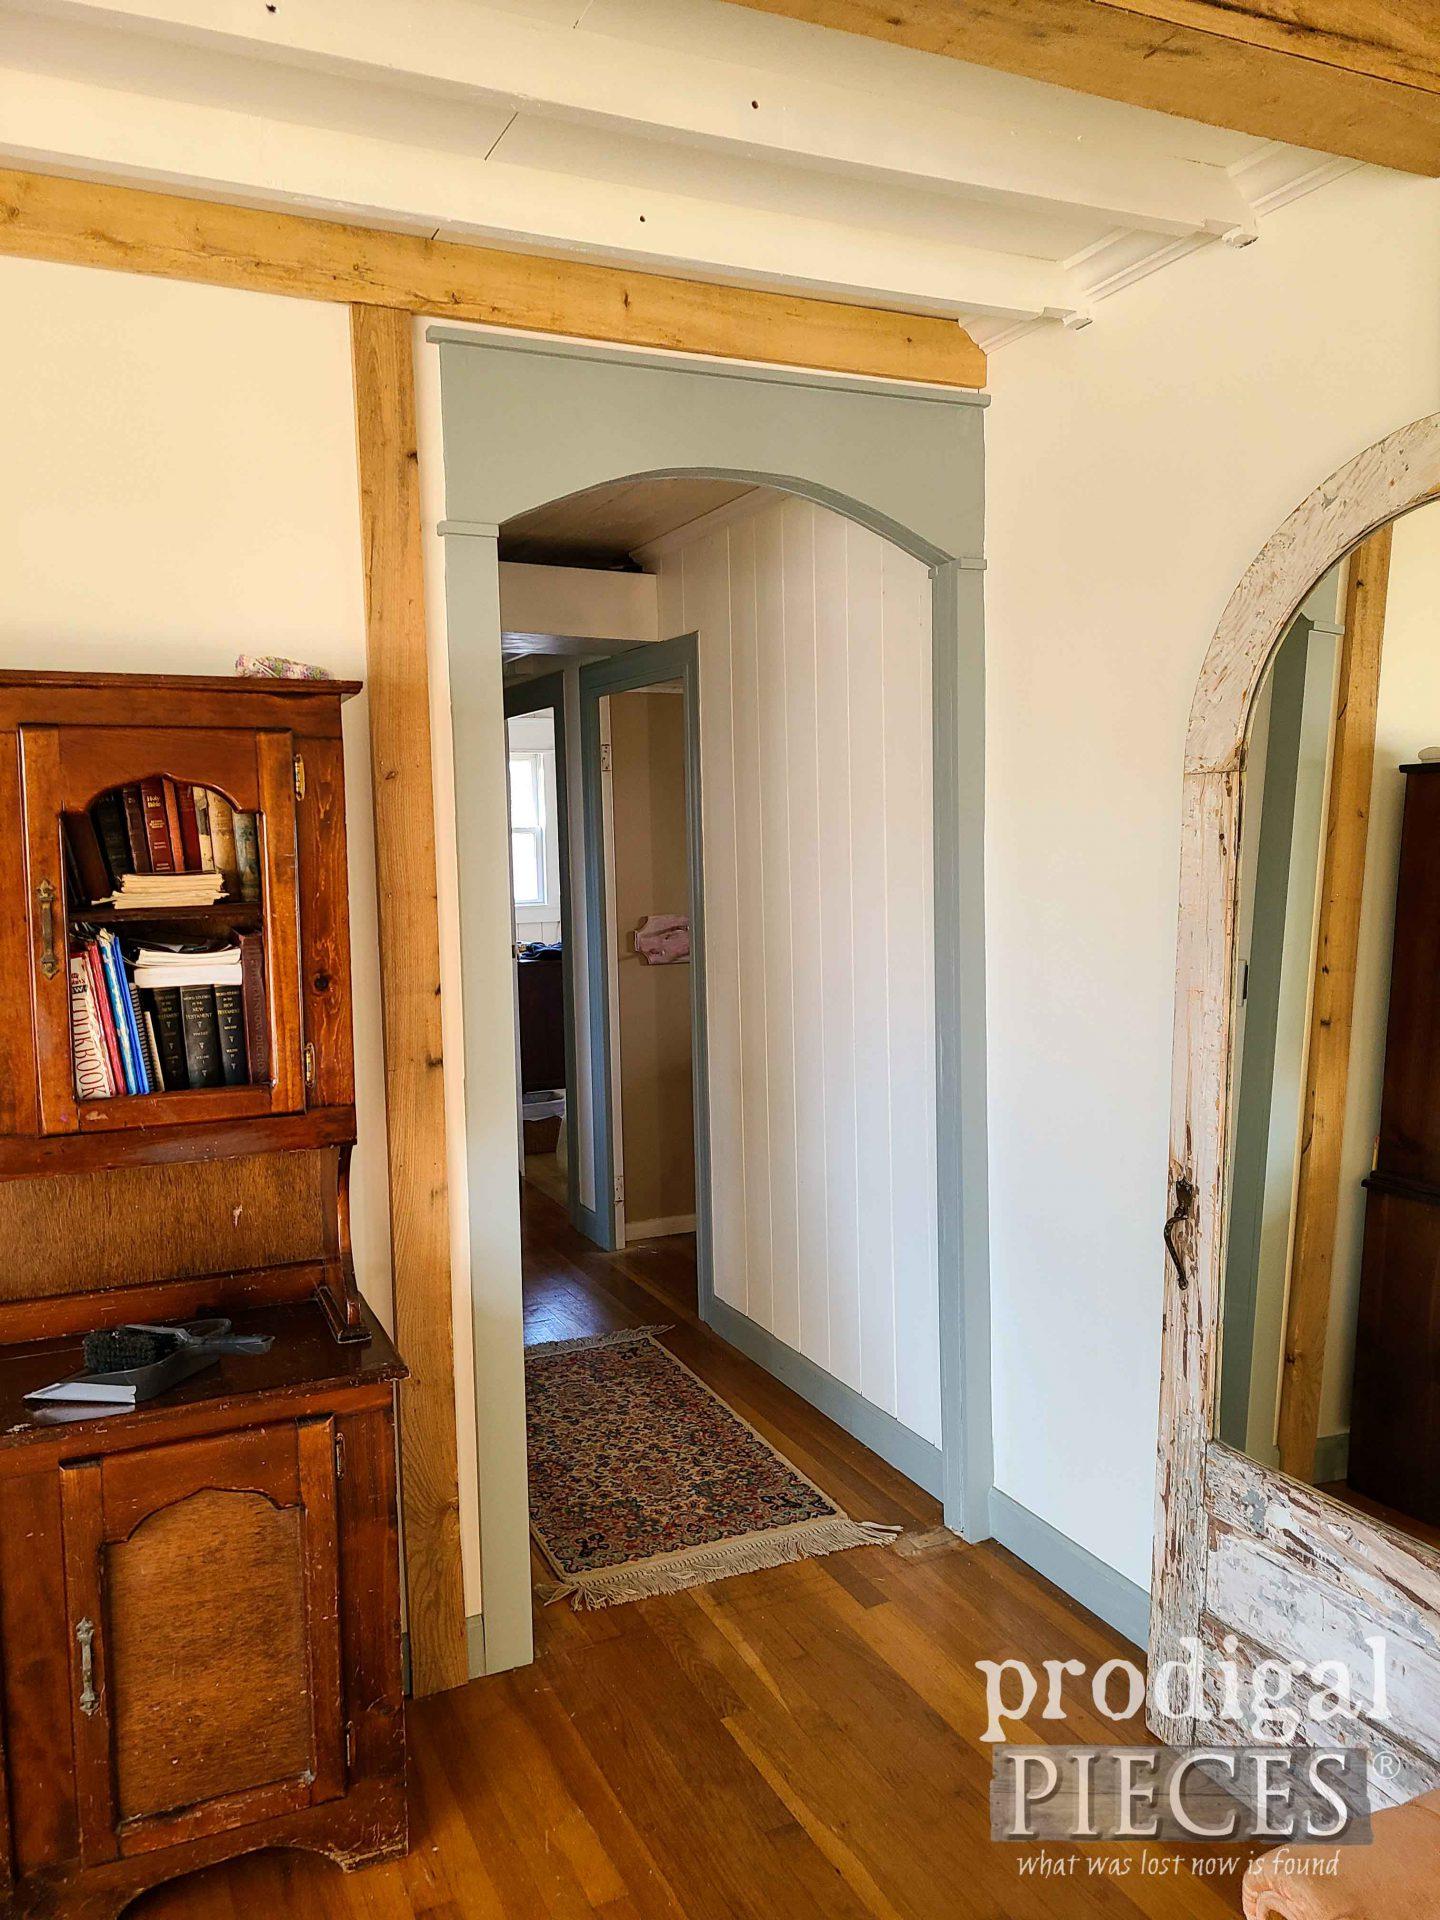 DIY Arched Living Room Doorway by Larissa of Prodigal Pieces | prodigalpieces.com #prodigalpieces #farmhouse #home #diy